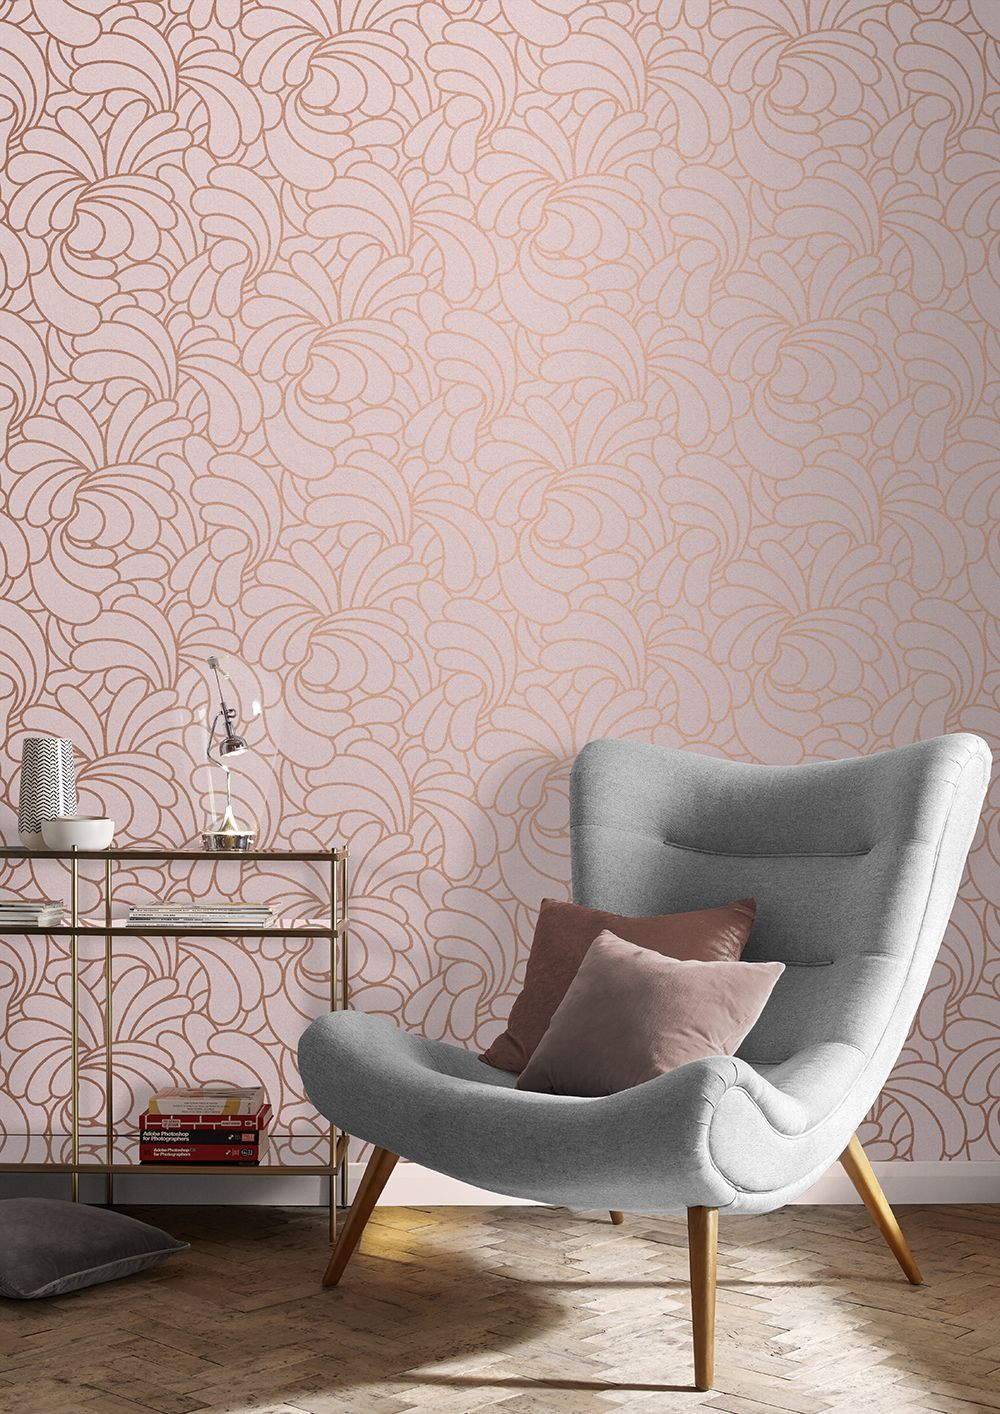 Big Bold And Iconic Barbara Hulanicki S Bananas Copper Blush Wallpaper Design Has Been Remastered In A B Blush Wallpaper Copper Living Room Rose Gold Bedroom